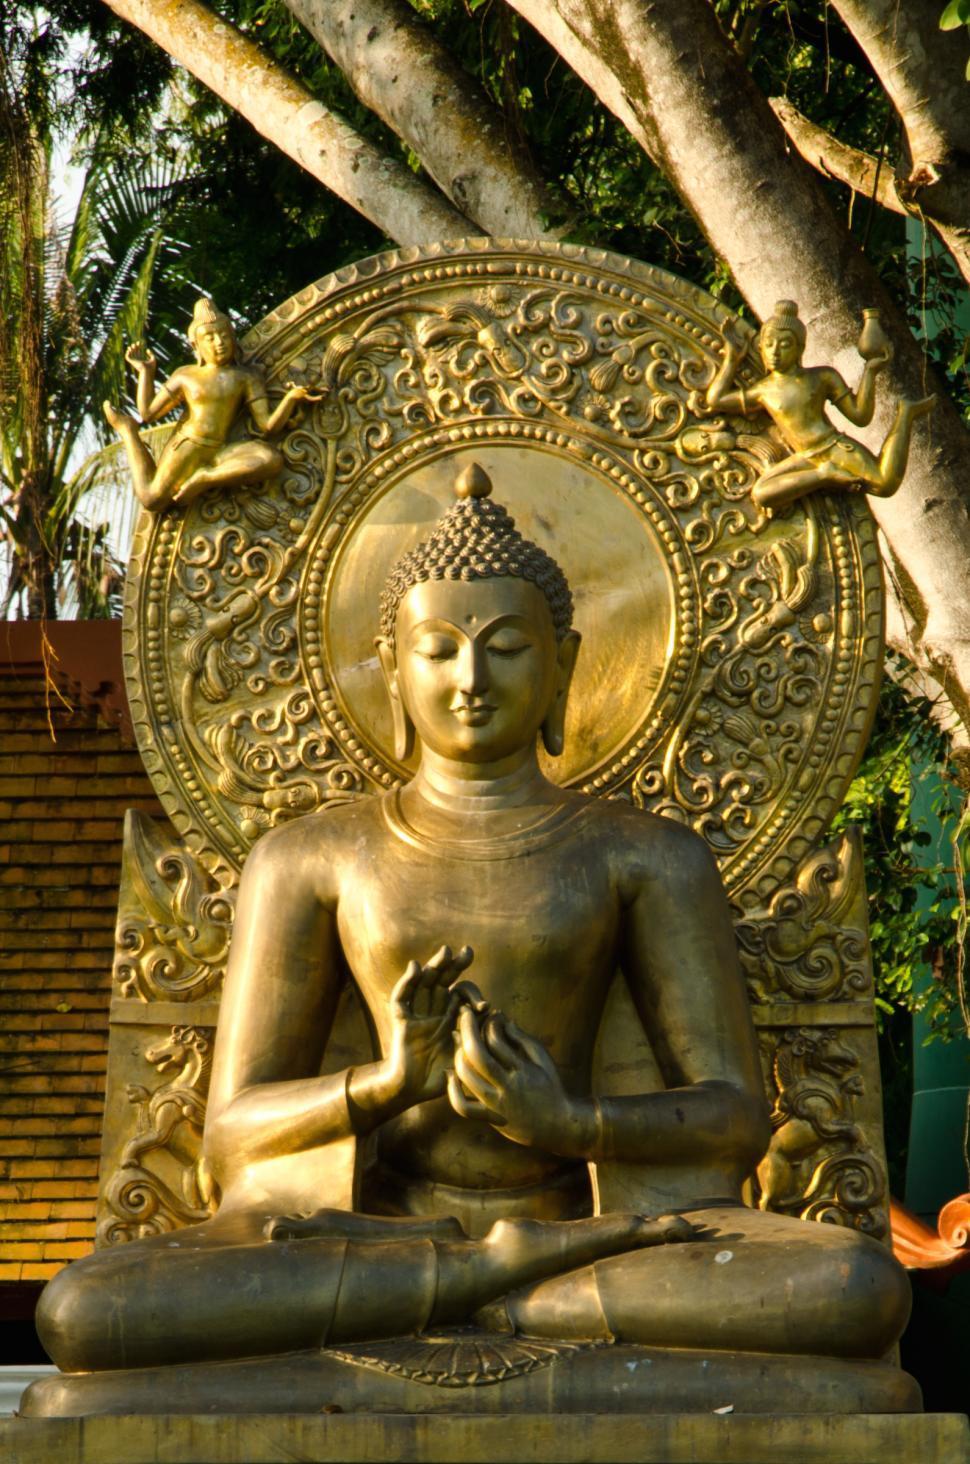 Download Free Stock Photo of Buddha Image